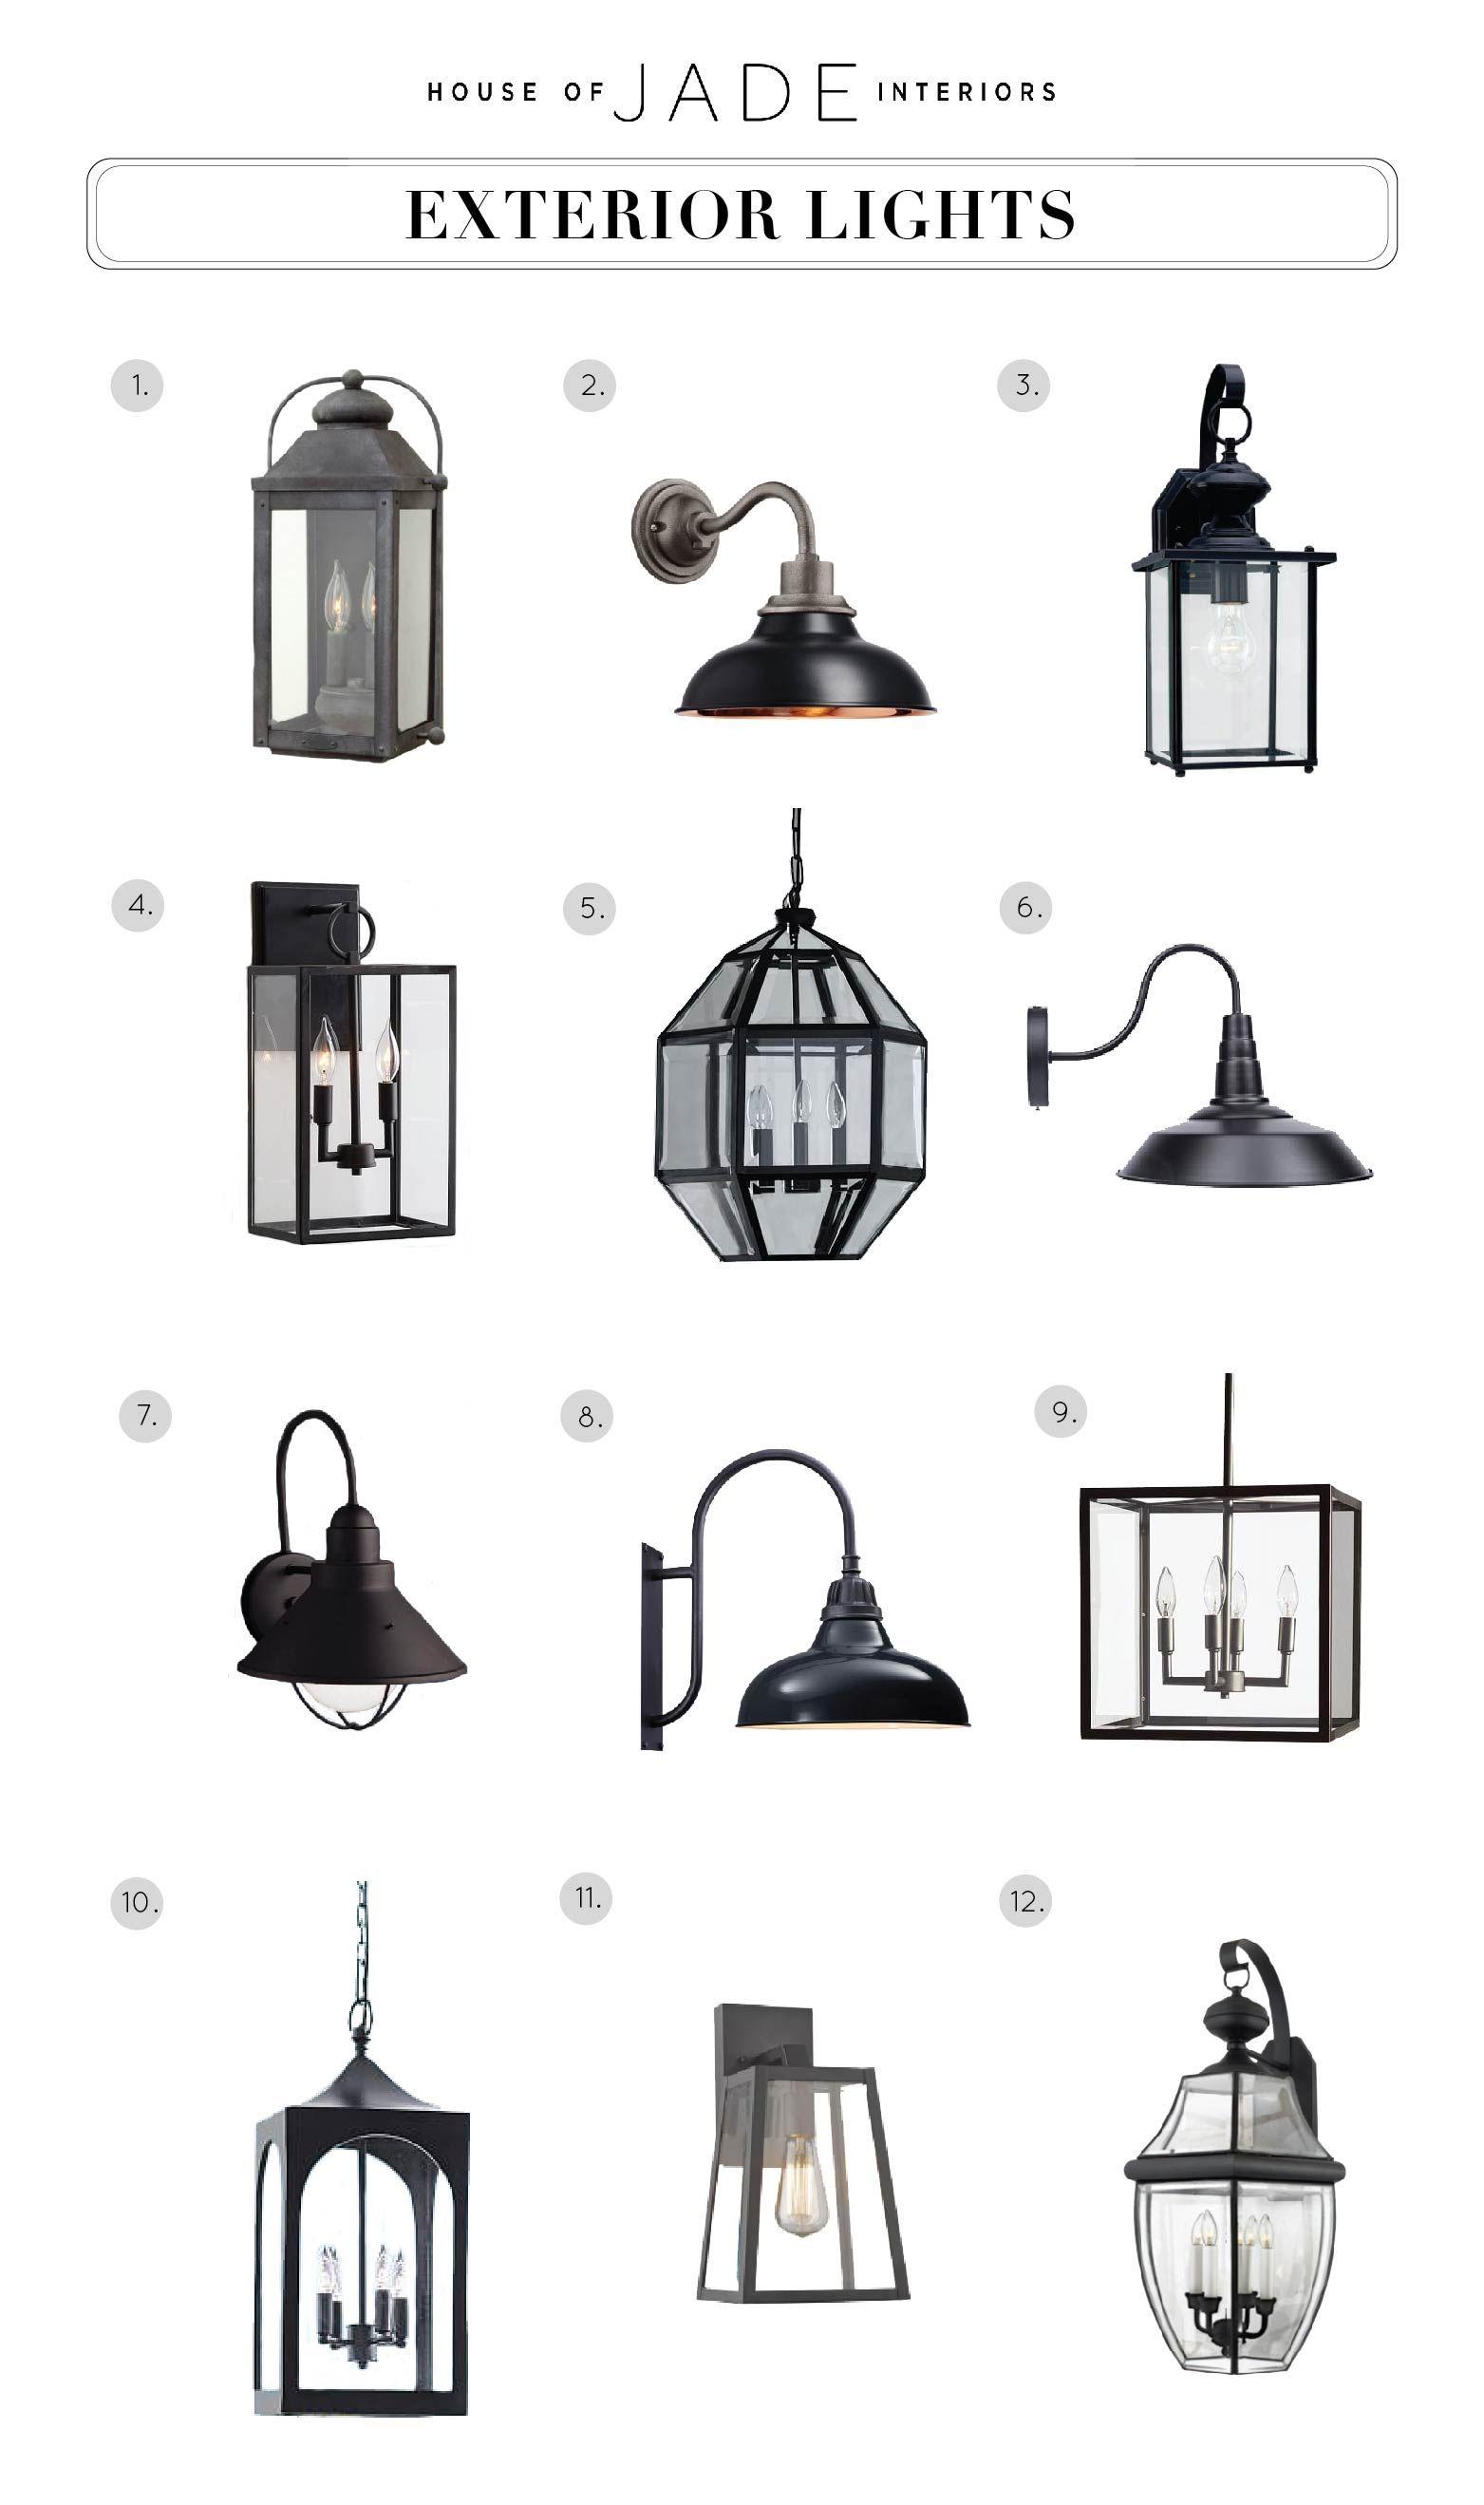 Design tip exterior lights house of jade interiors blog